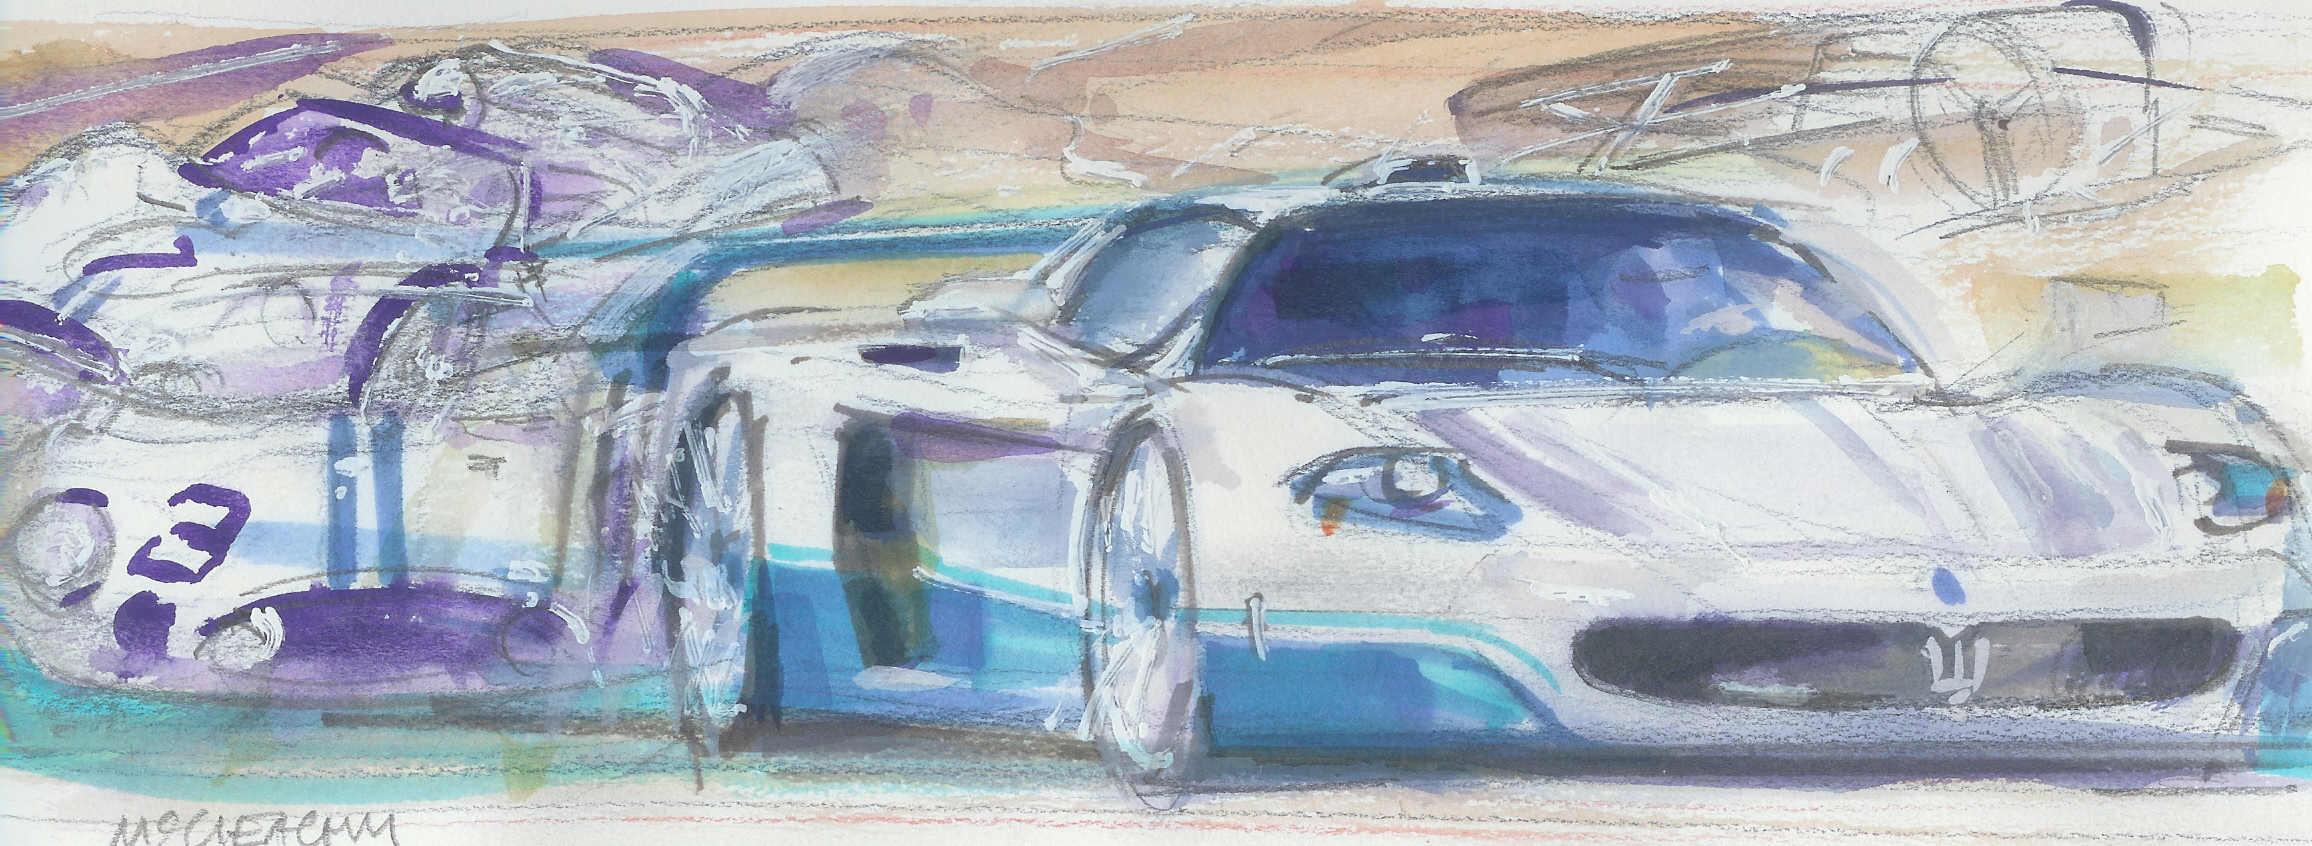 Maserati MC 12 sketch